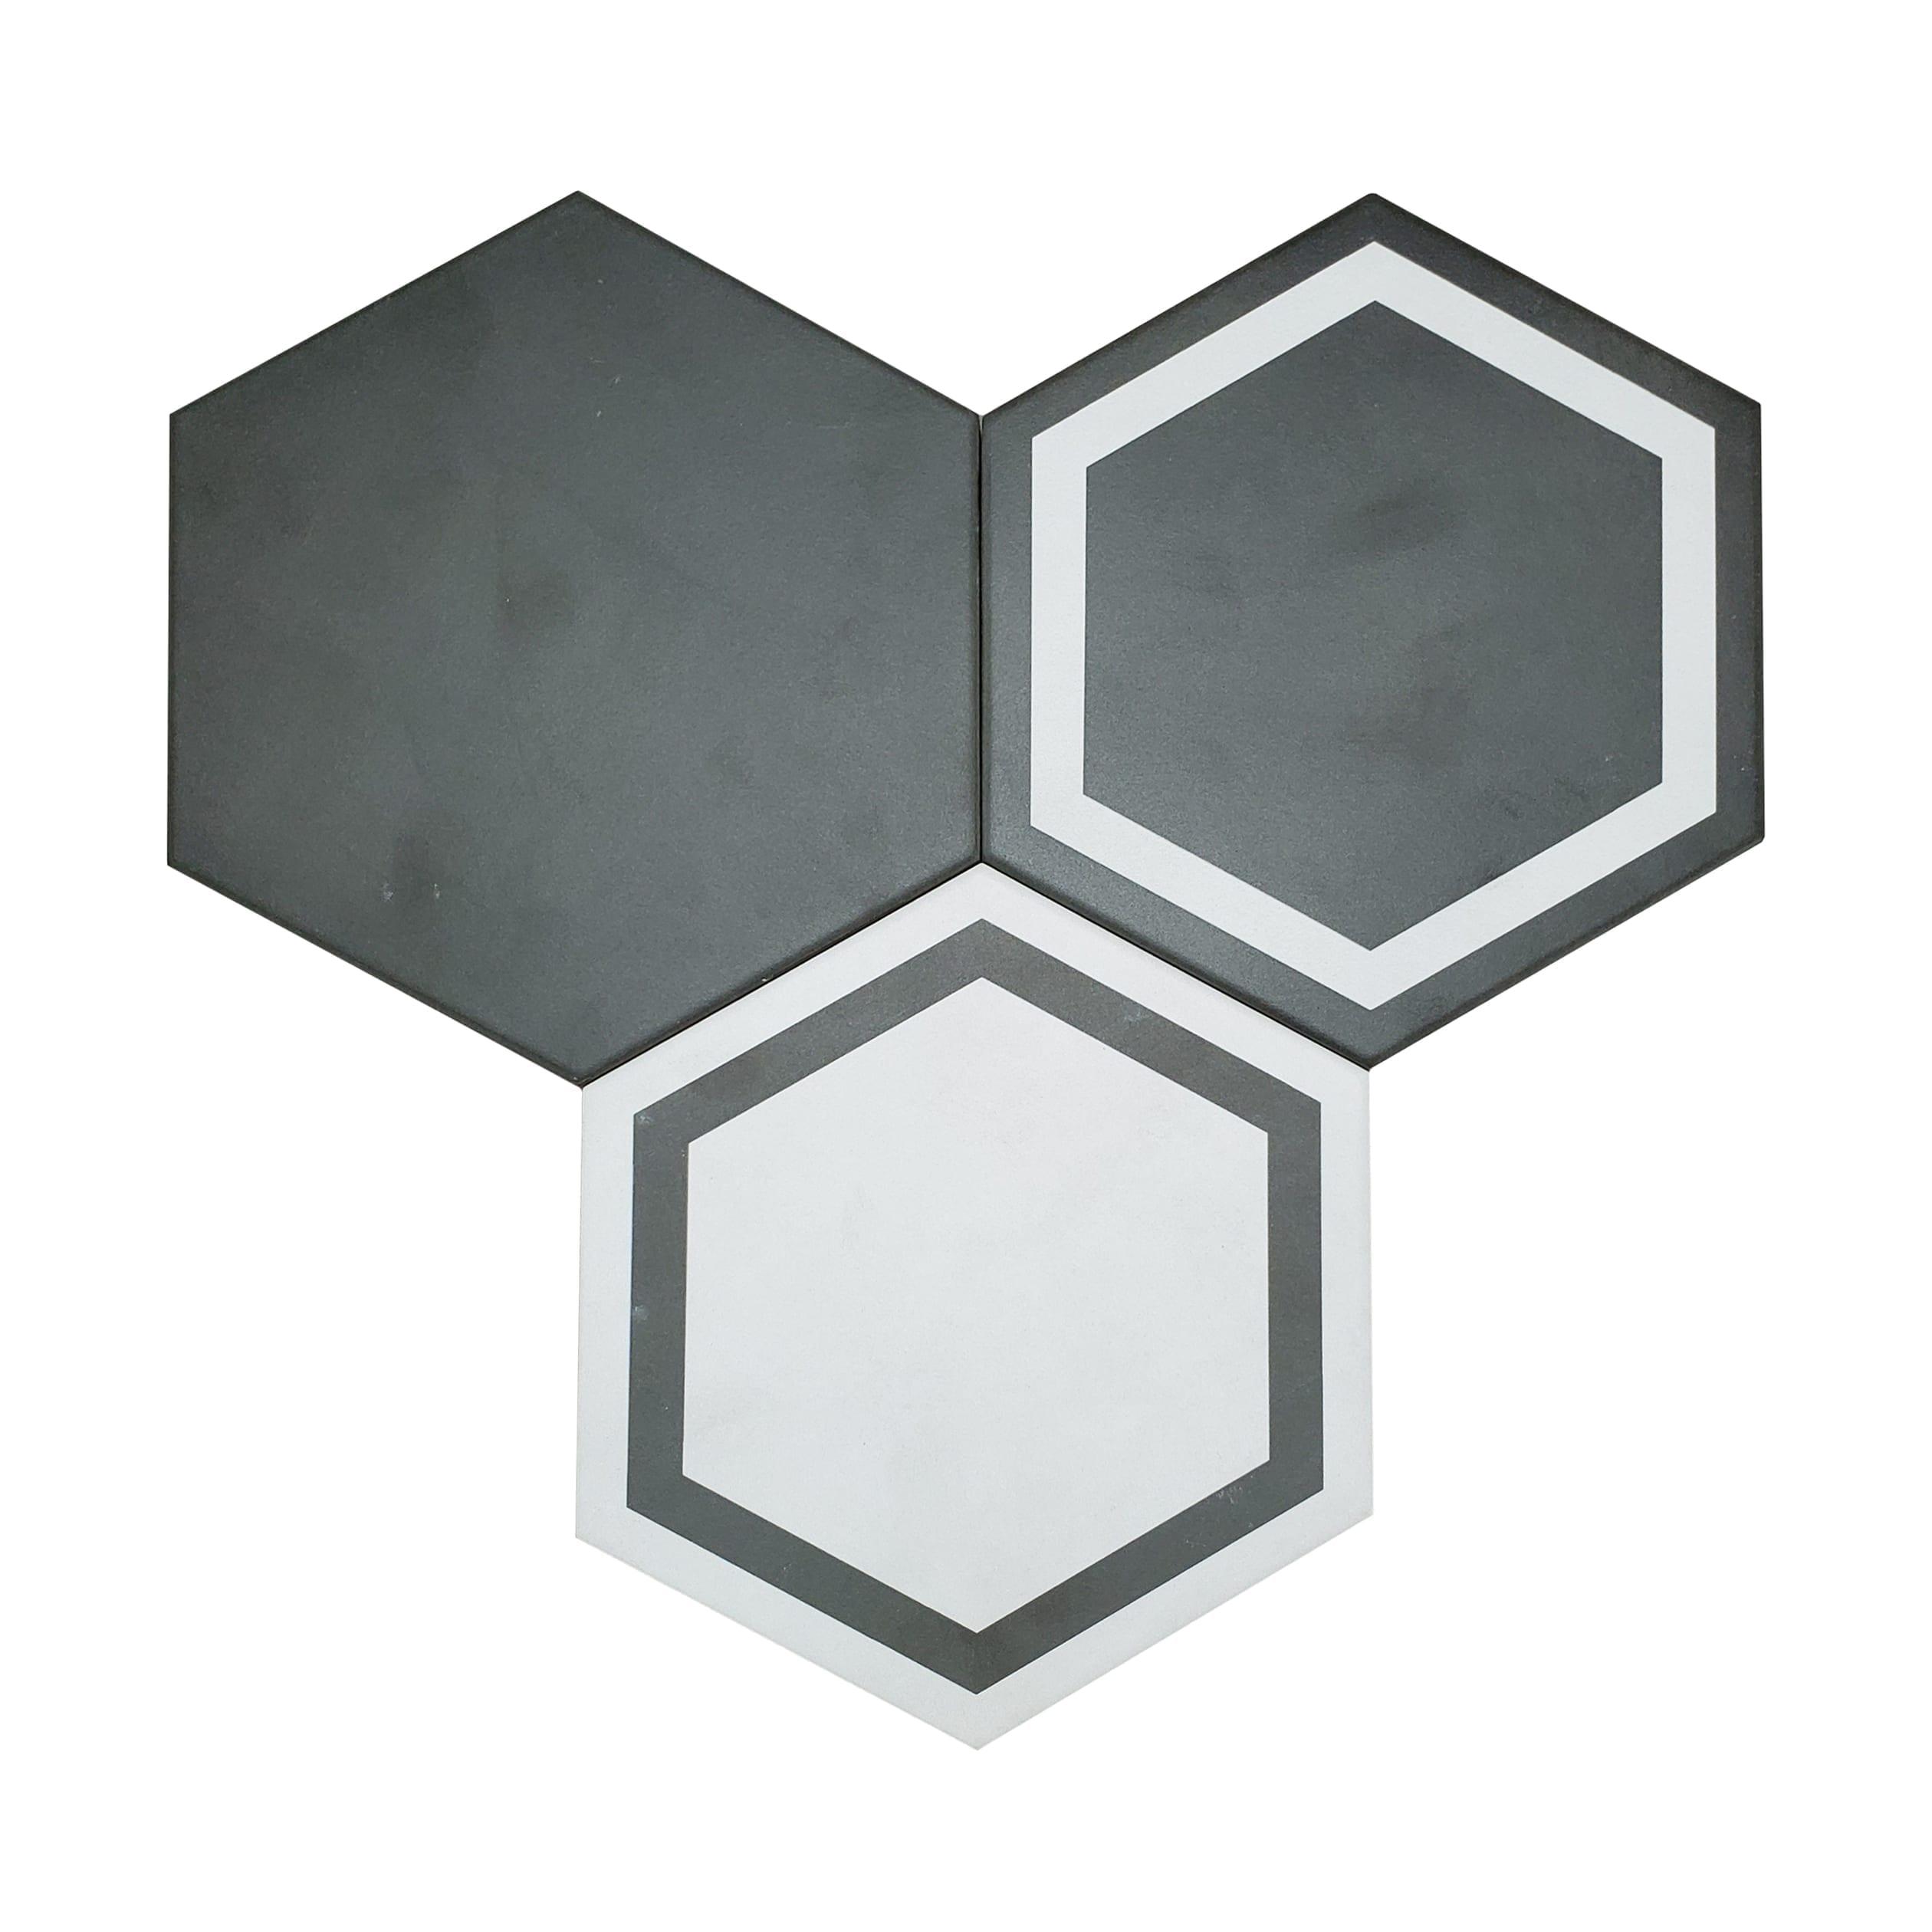 7×8 Form Hexagon Wall or Floor_GraphiteMixAlternate-3.89